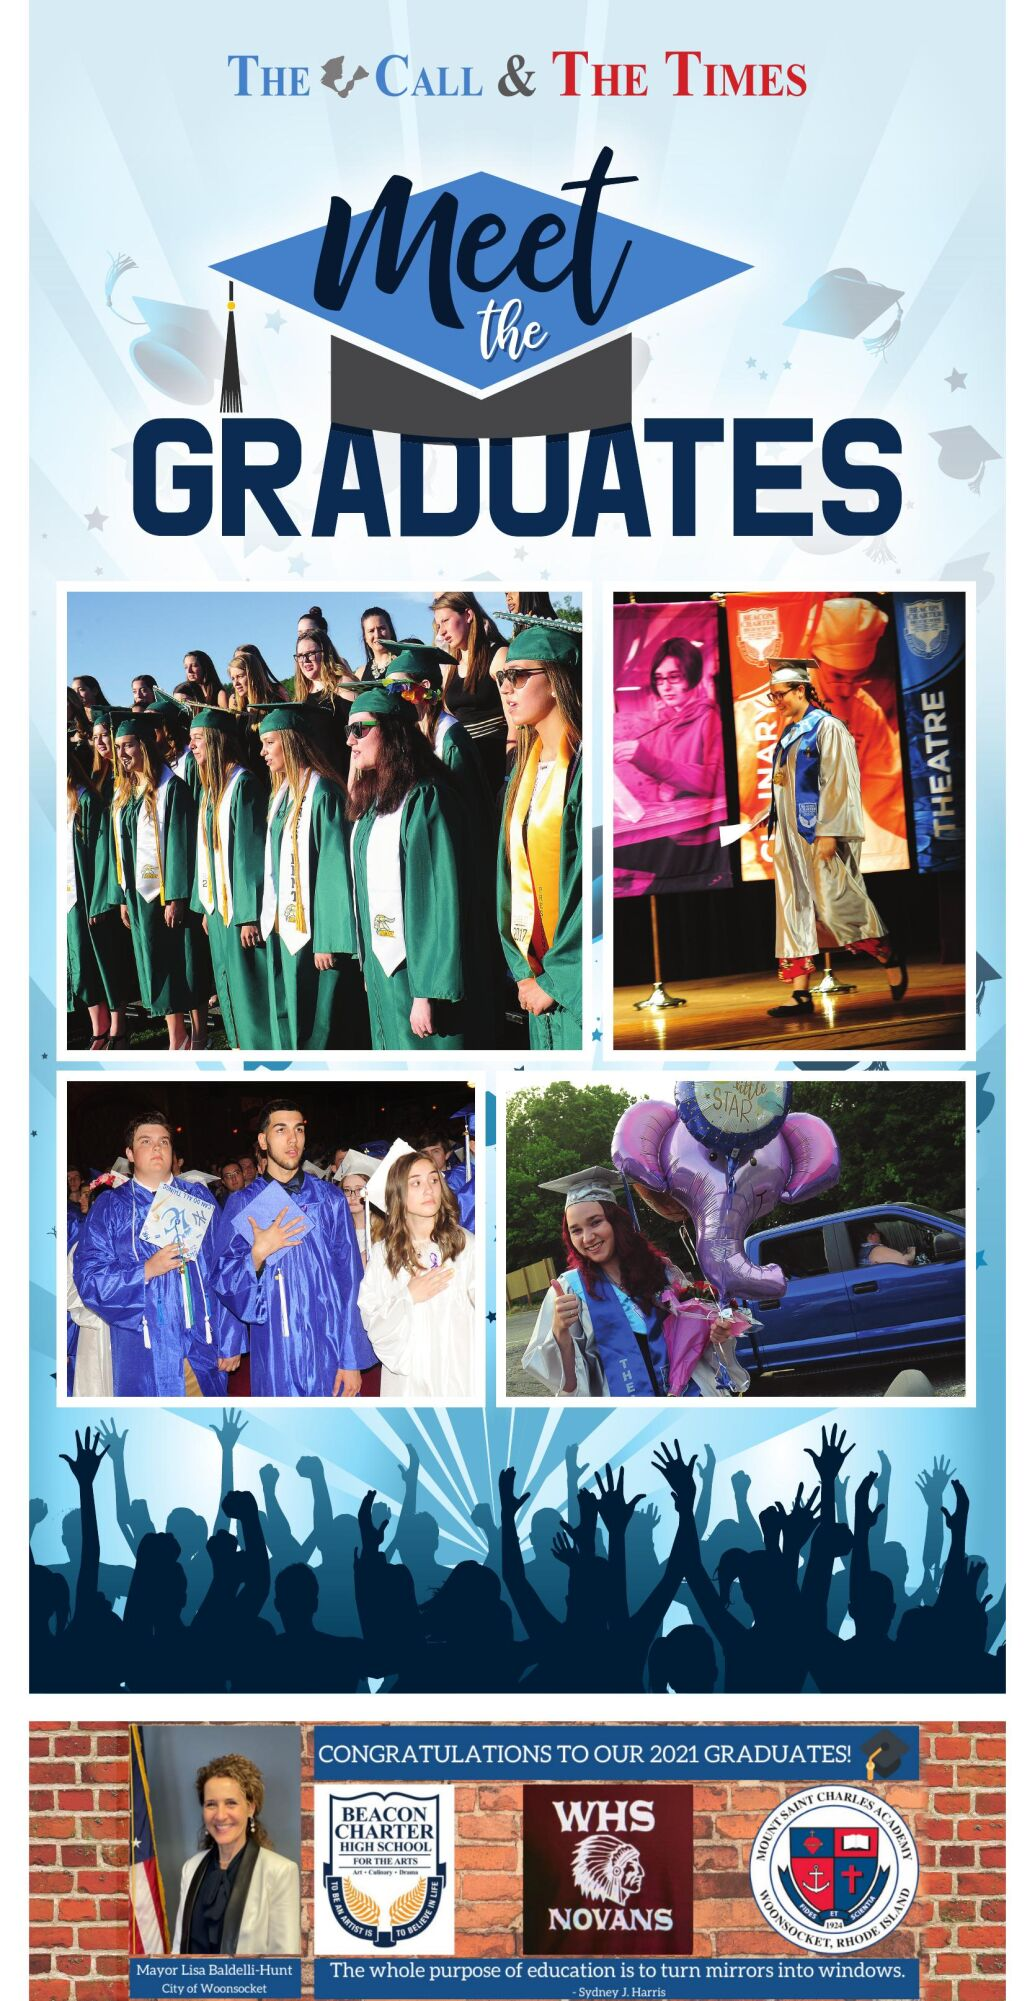 Meet The Graduates